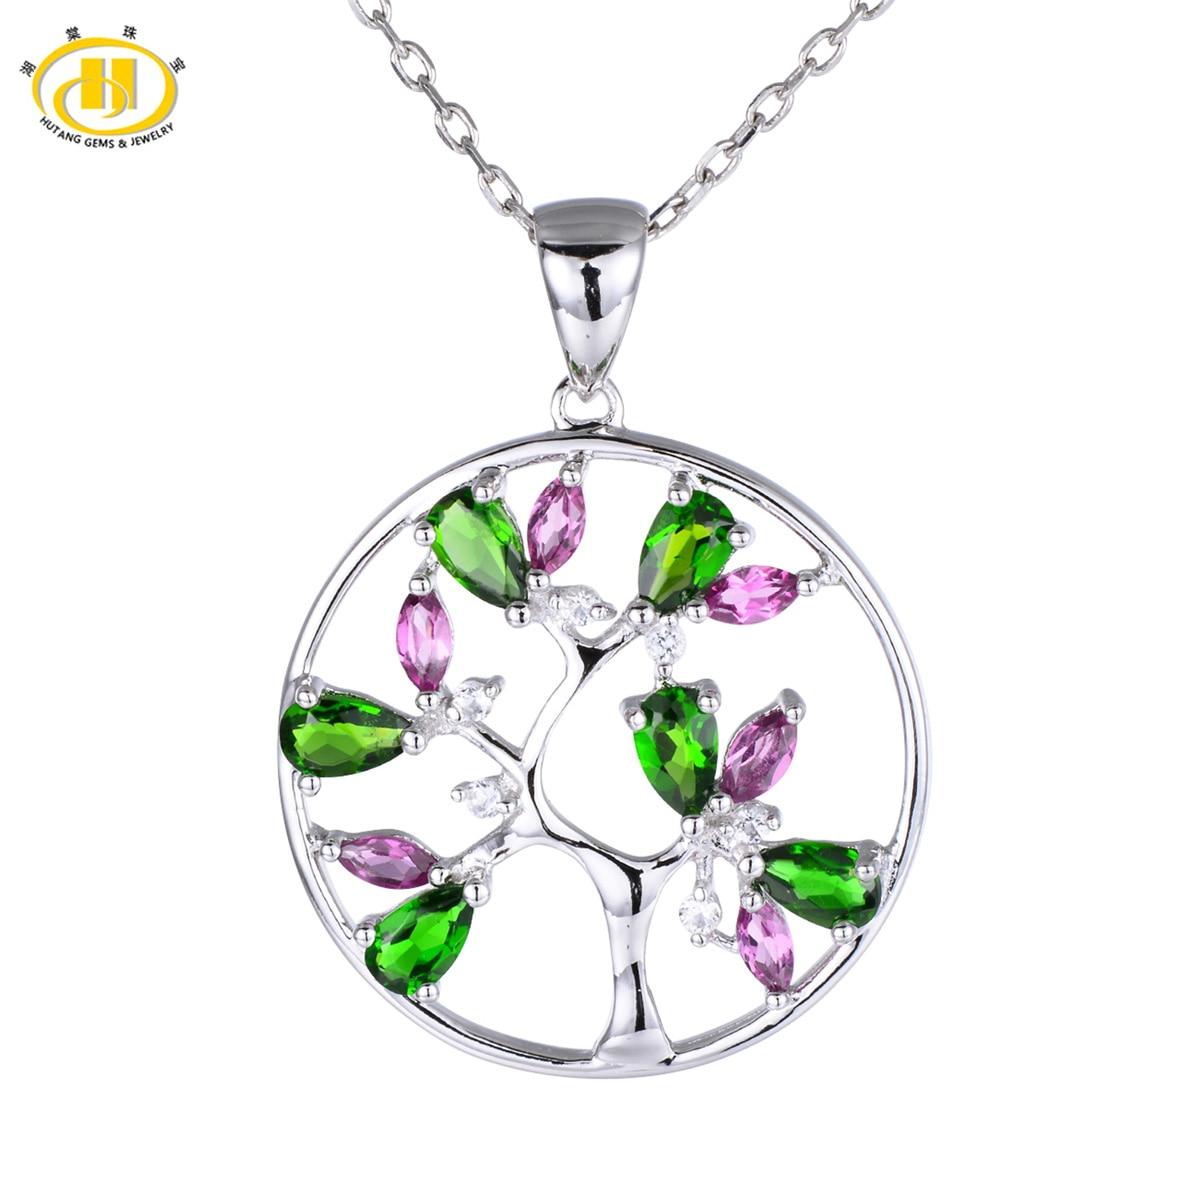 Здесь продается  Hutang Classic Natural Chrome Diopside & Rhodolite Tree Pendant 925 Sterling Silver Topaz Gemstone Necklace Fine Jewelry Gift  Ювелирные изделия и часы